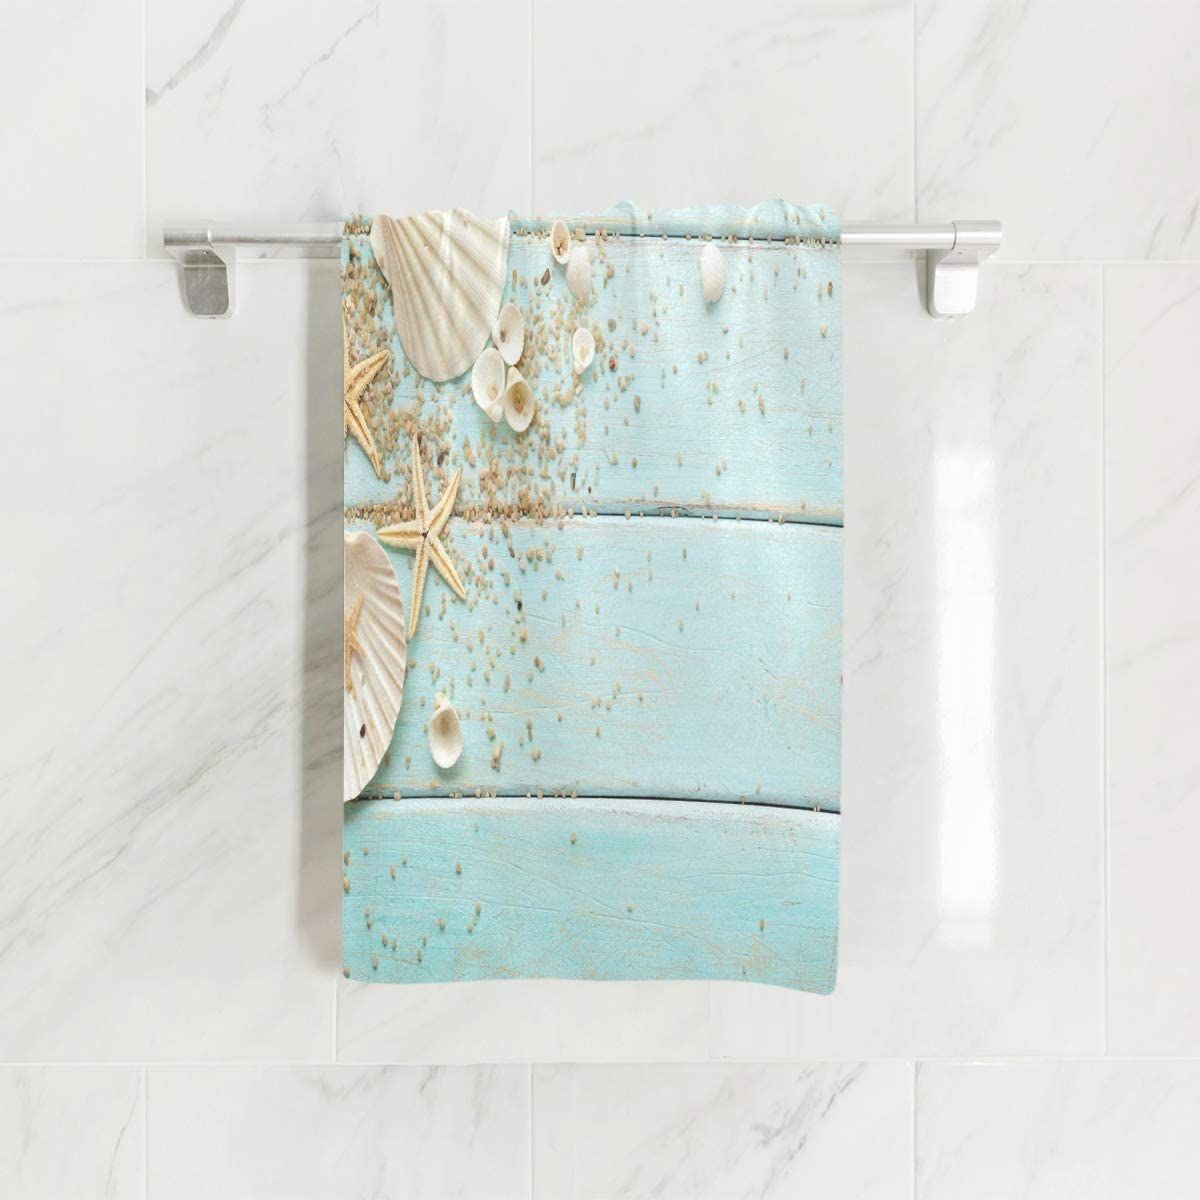 SUABO Seashells Hand Towel Dish Towels Cotton Face Towel 30x15 inch Gym Yoga Towels for Bath Decor